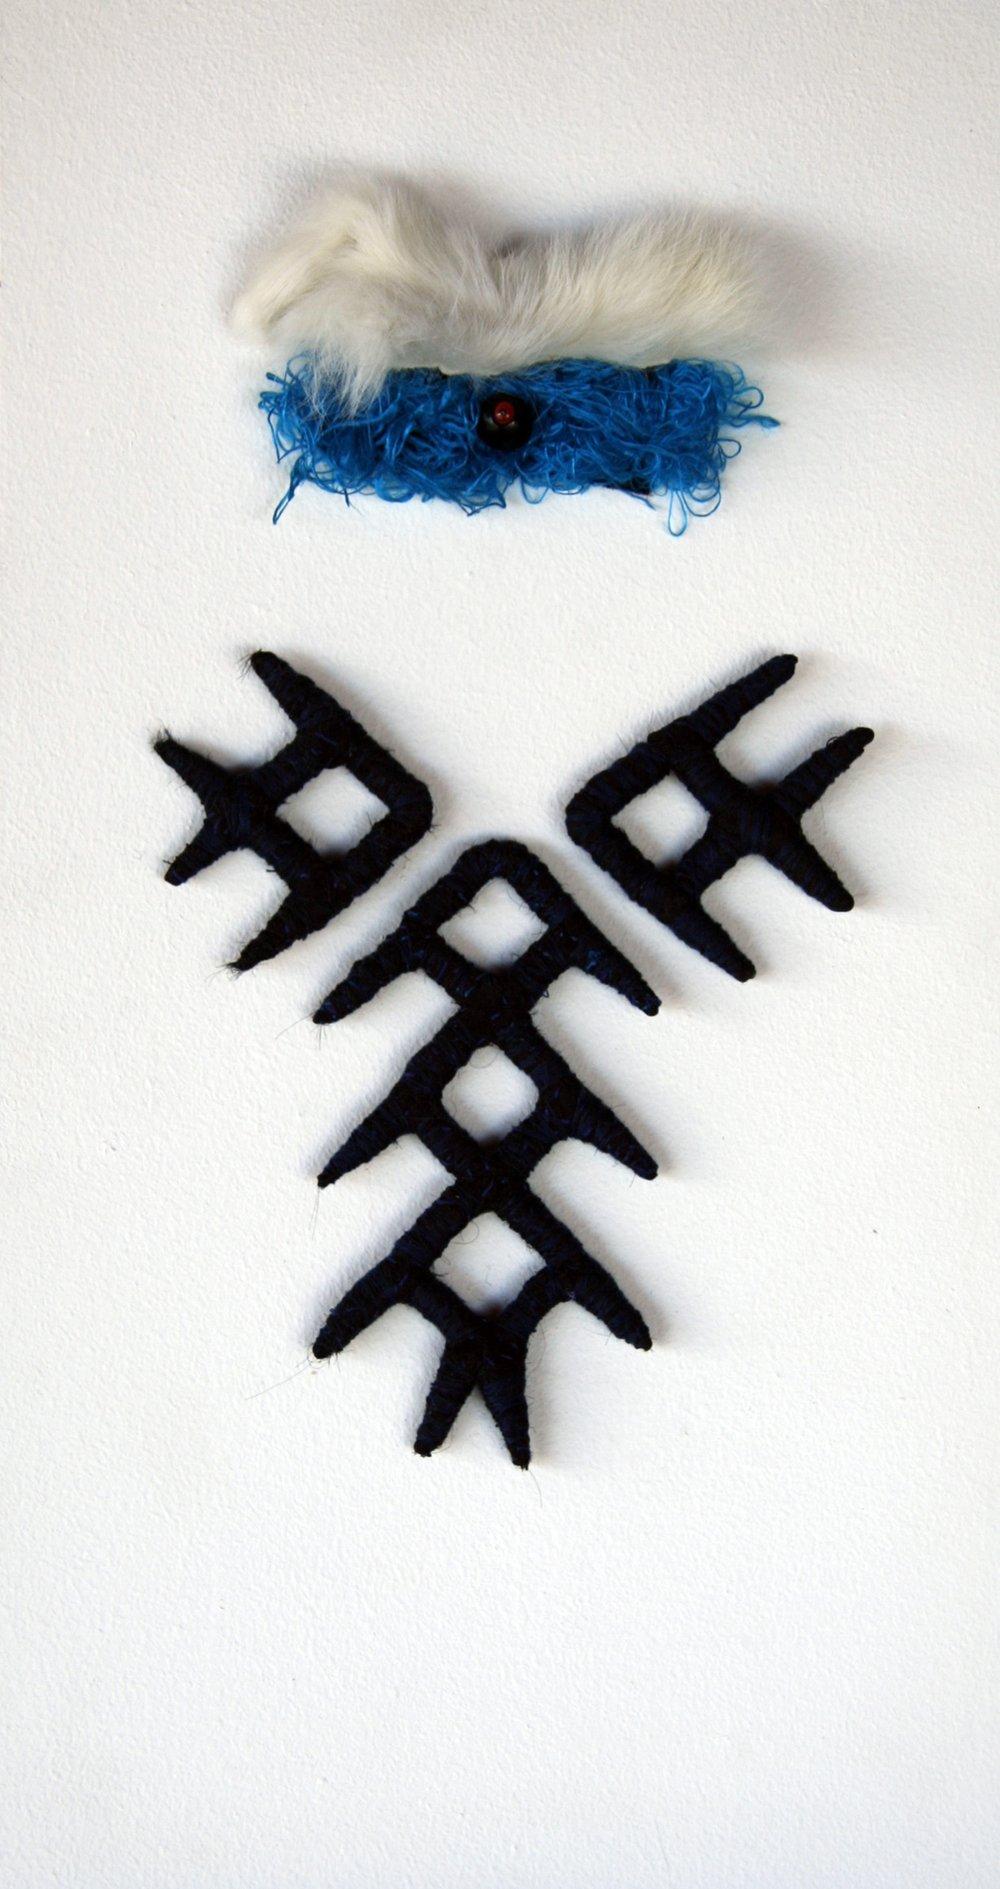 Francusi (2006/09). Wire, fur, fabric & glass bead.